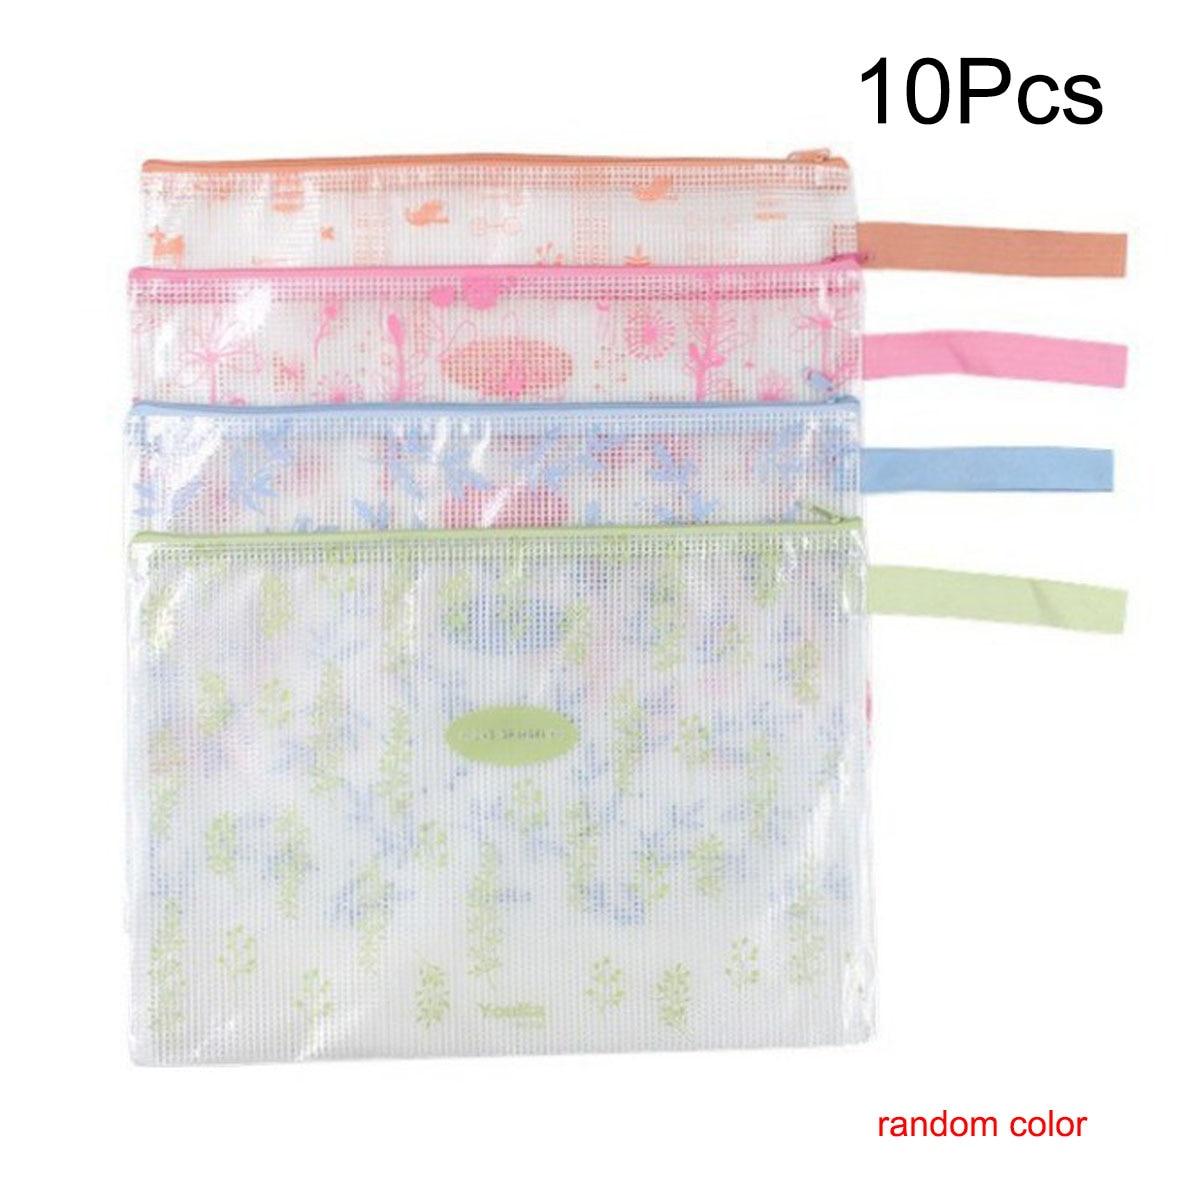 Hot sale 10 Pcs A4 Size Plastic Zip Document Filing Folder Bag Storage Pouch cewaal new design a4 photo laminator document hot